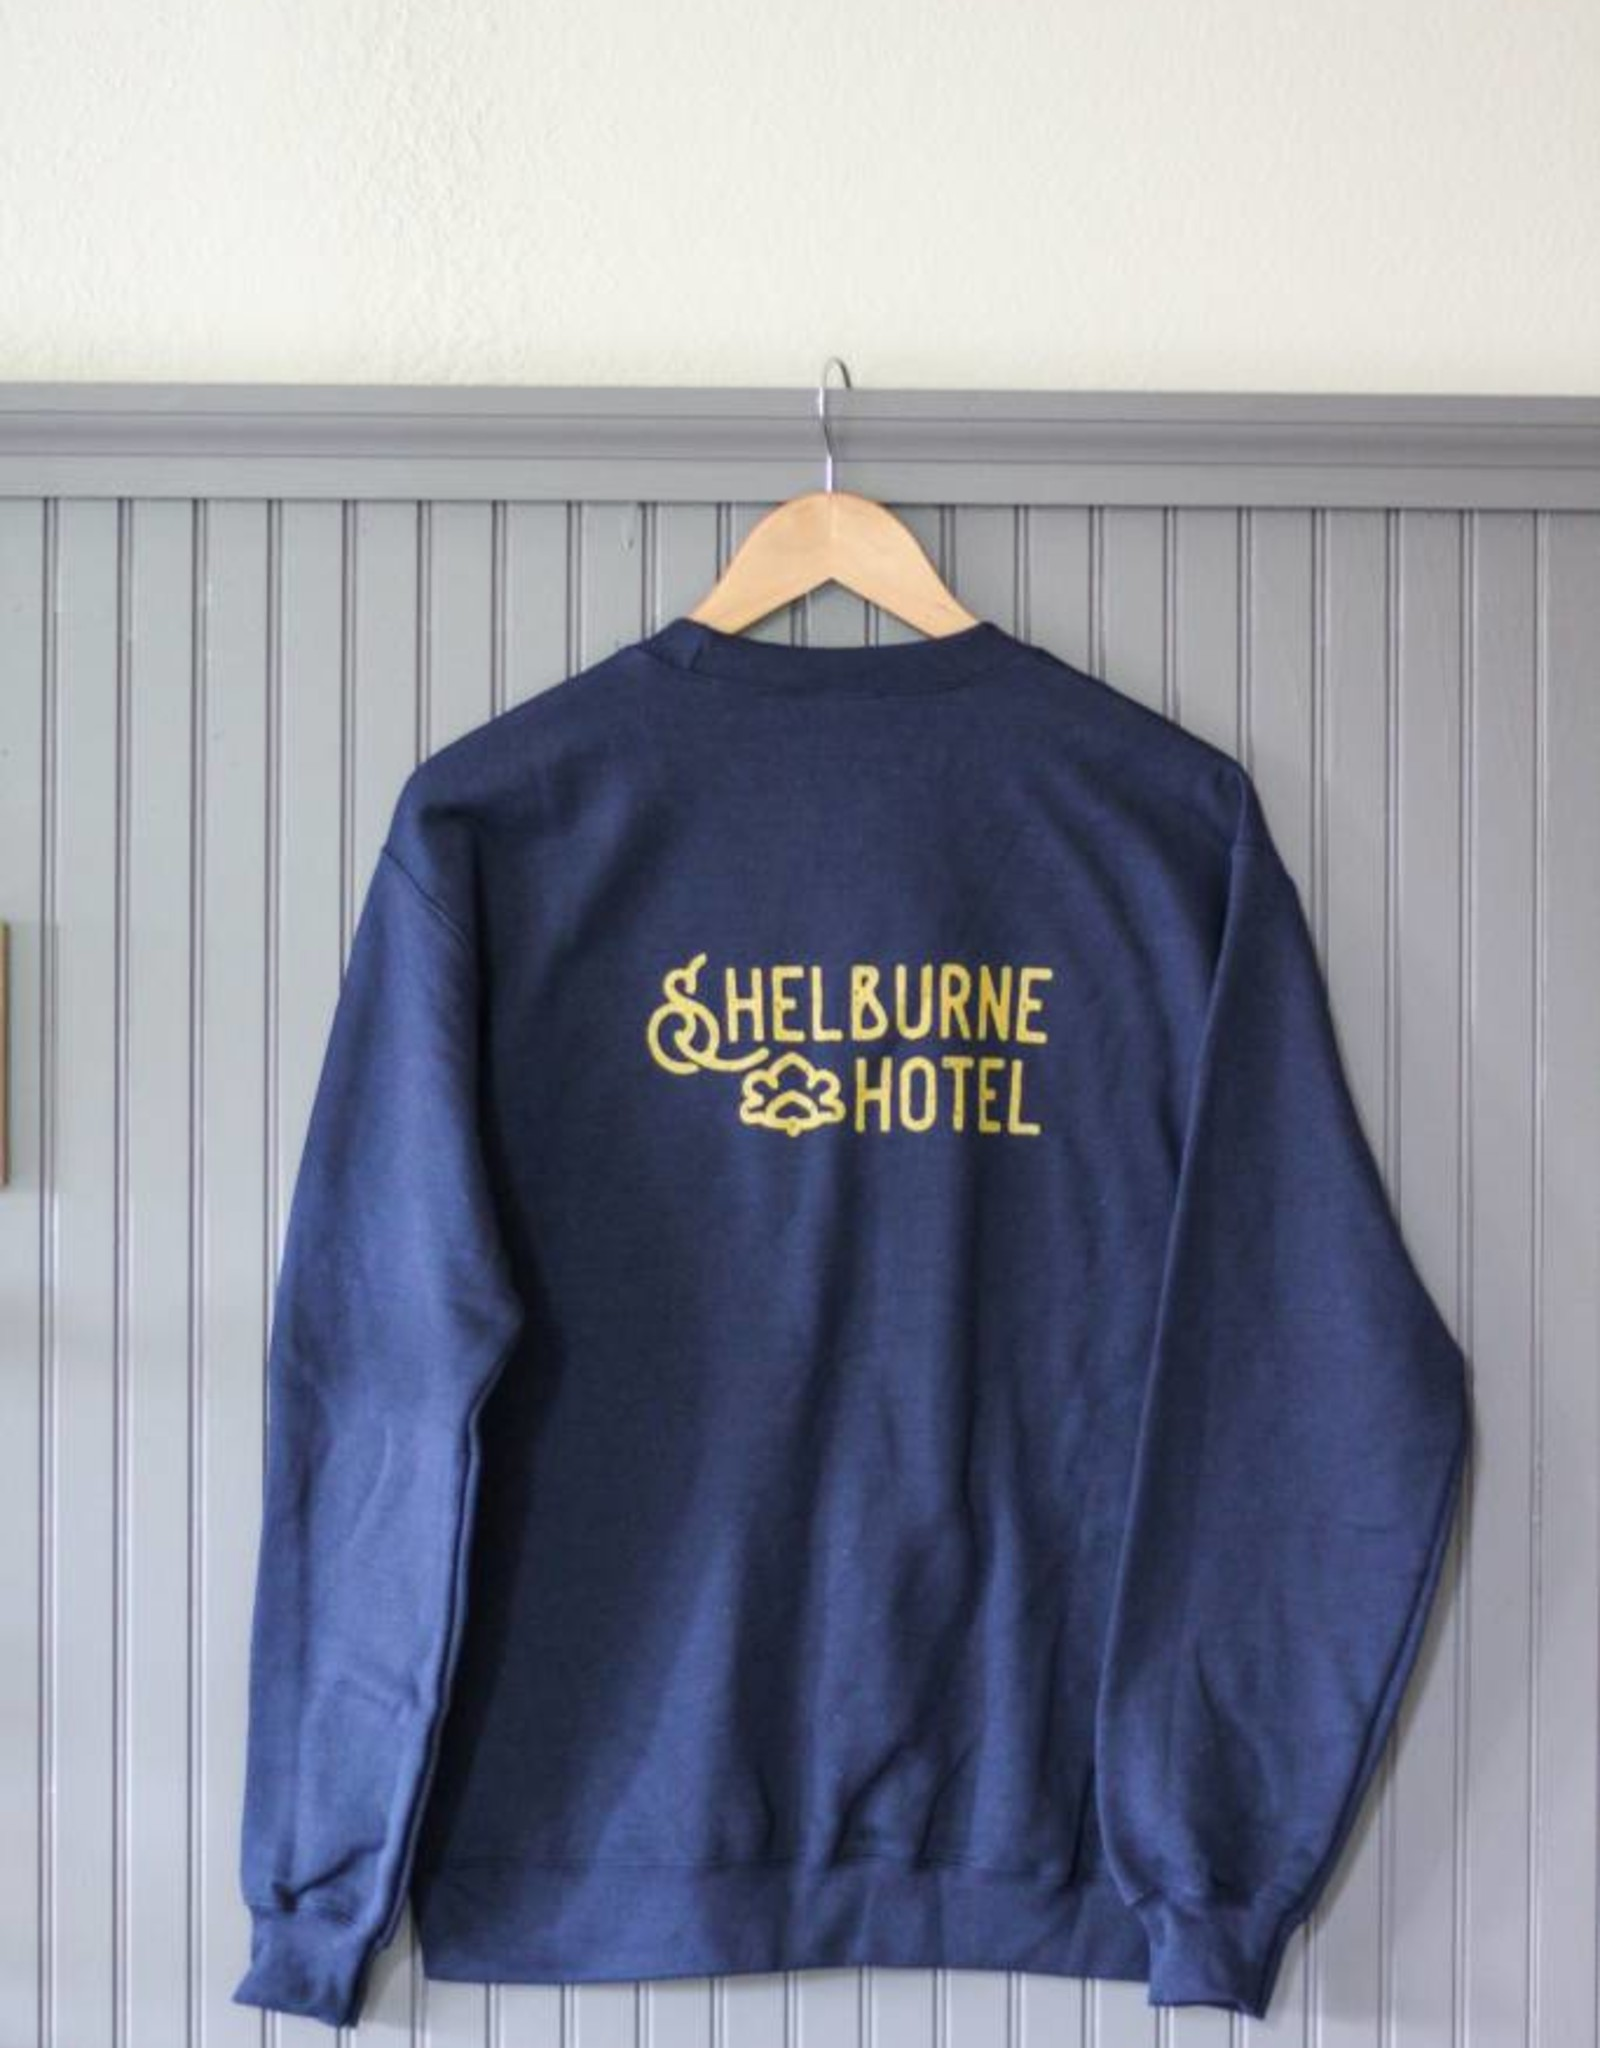 Shelburne Hotel Crew Neck